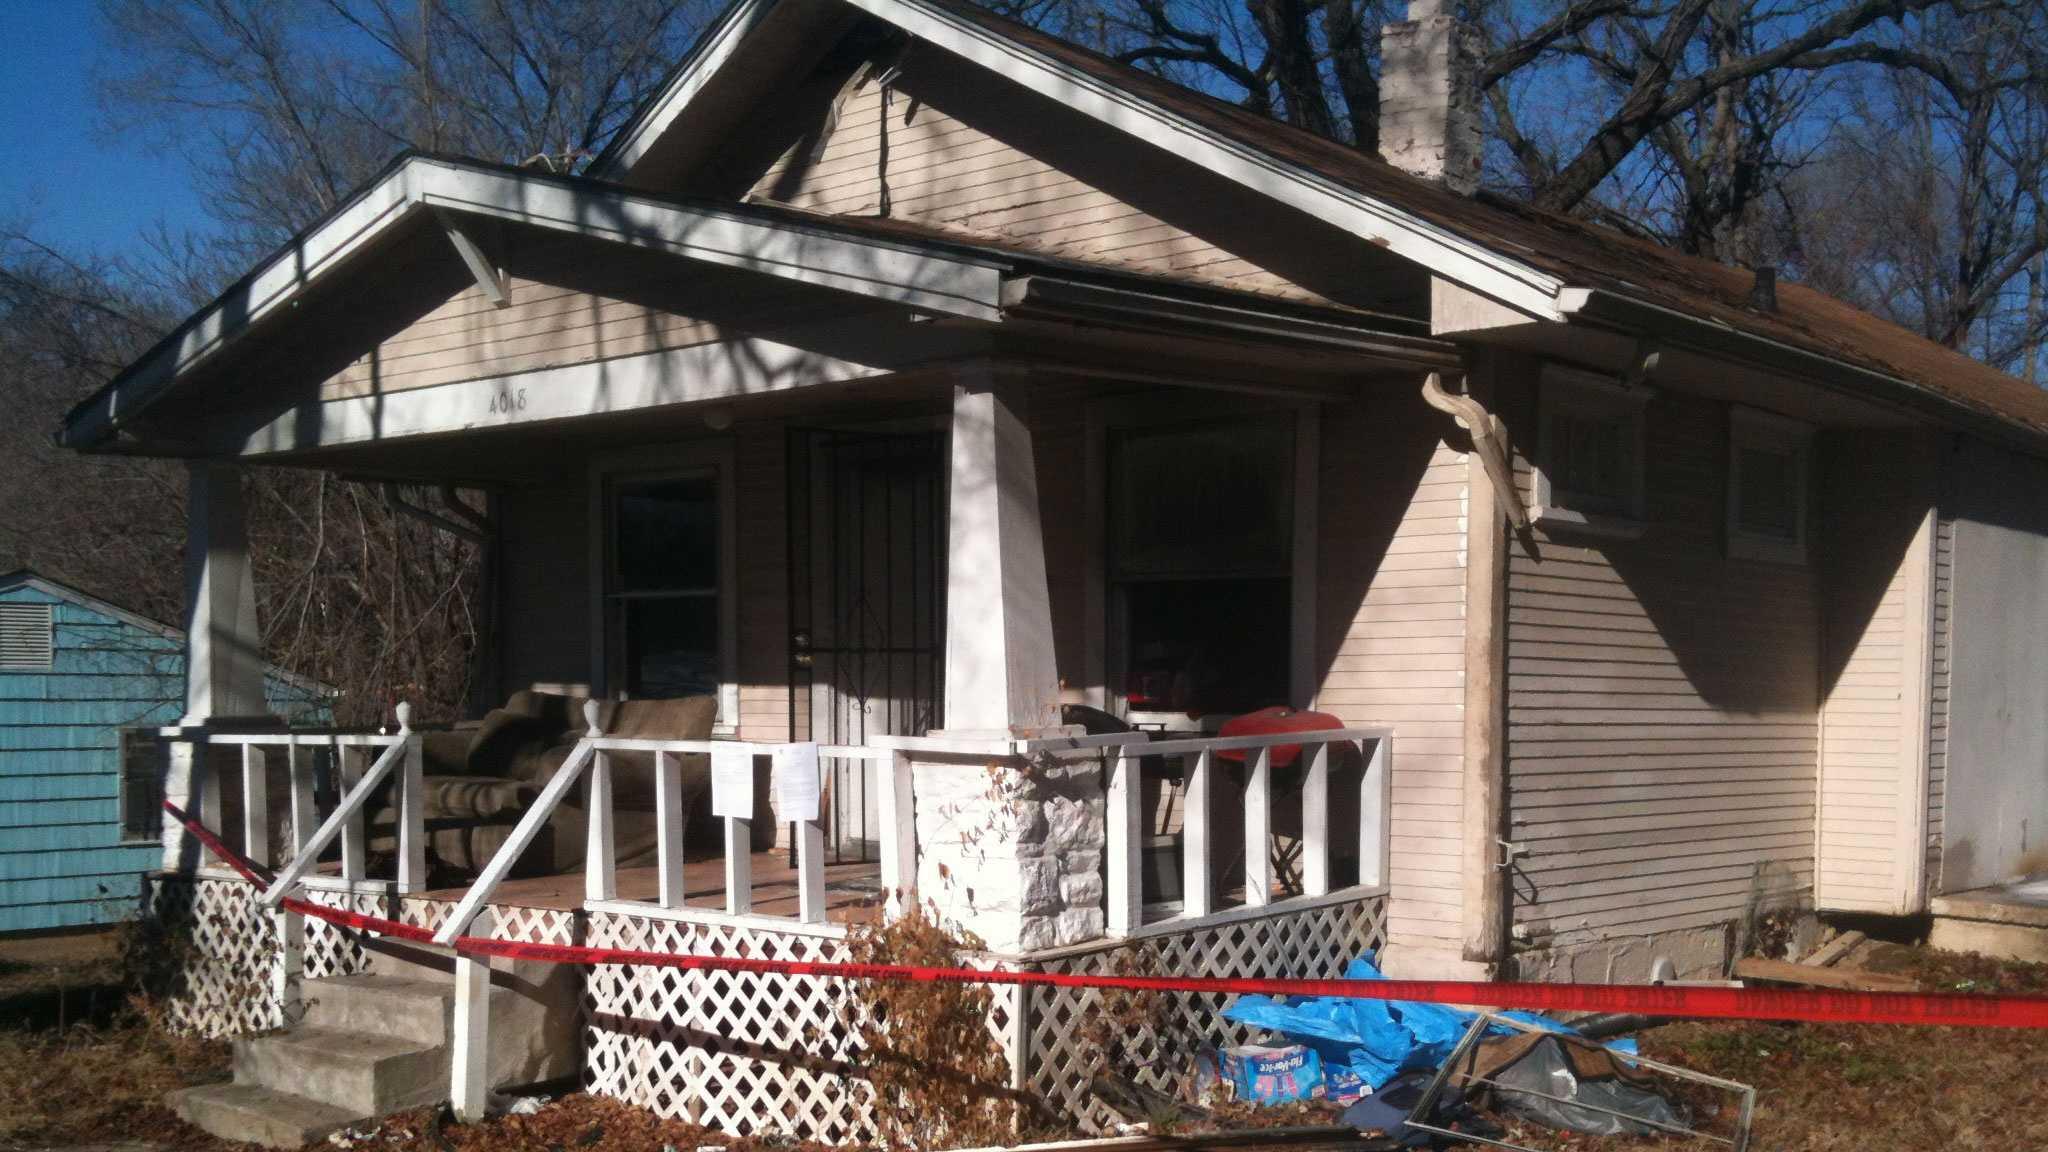 House fire, 4000 block of E. 69th Street